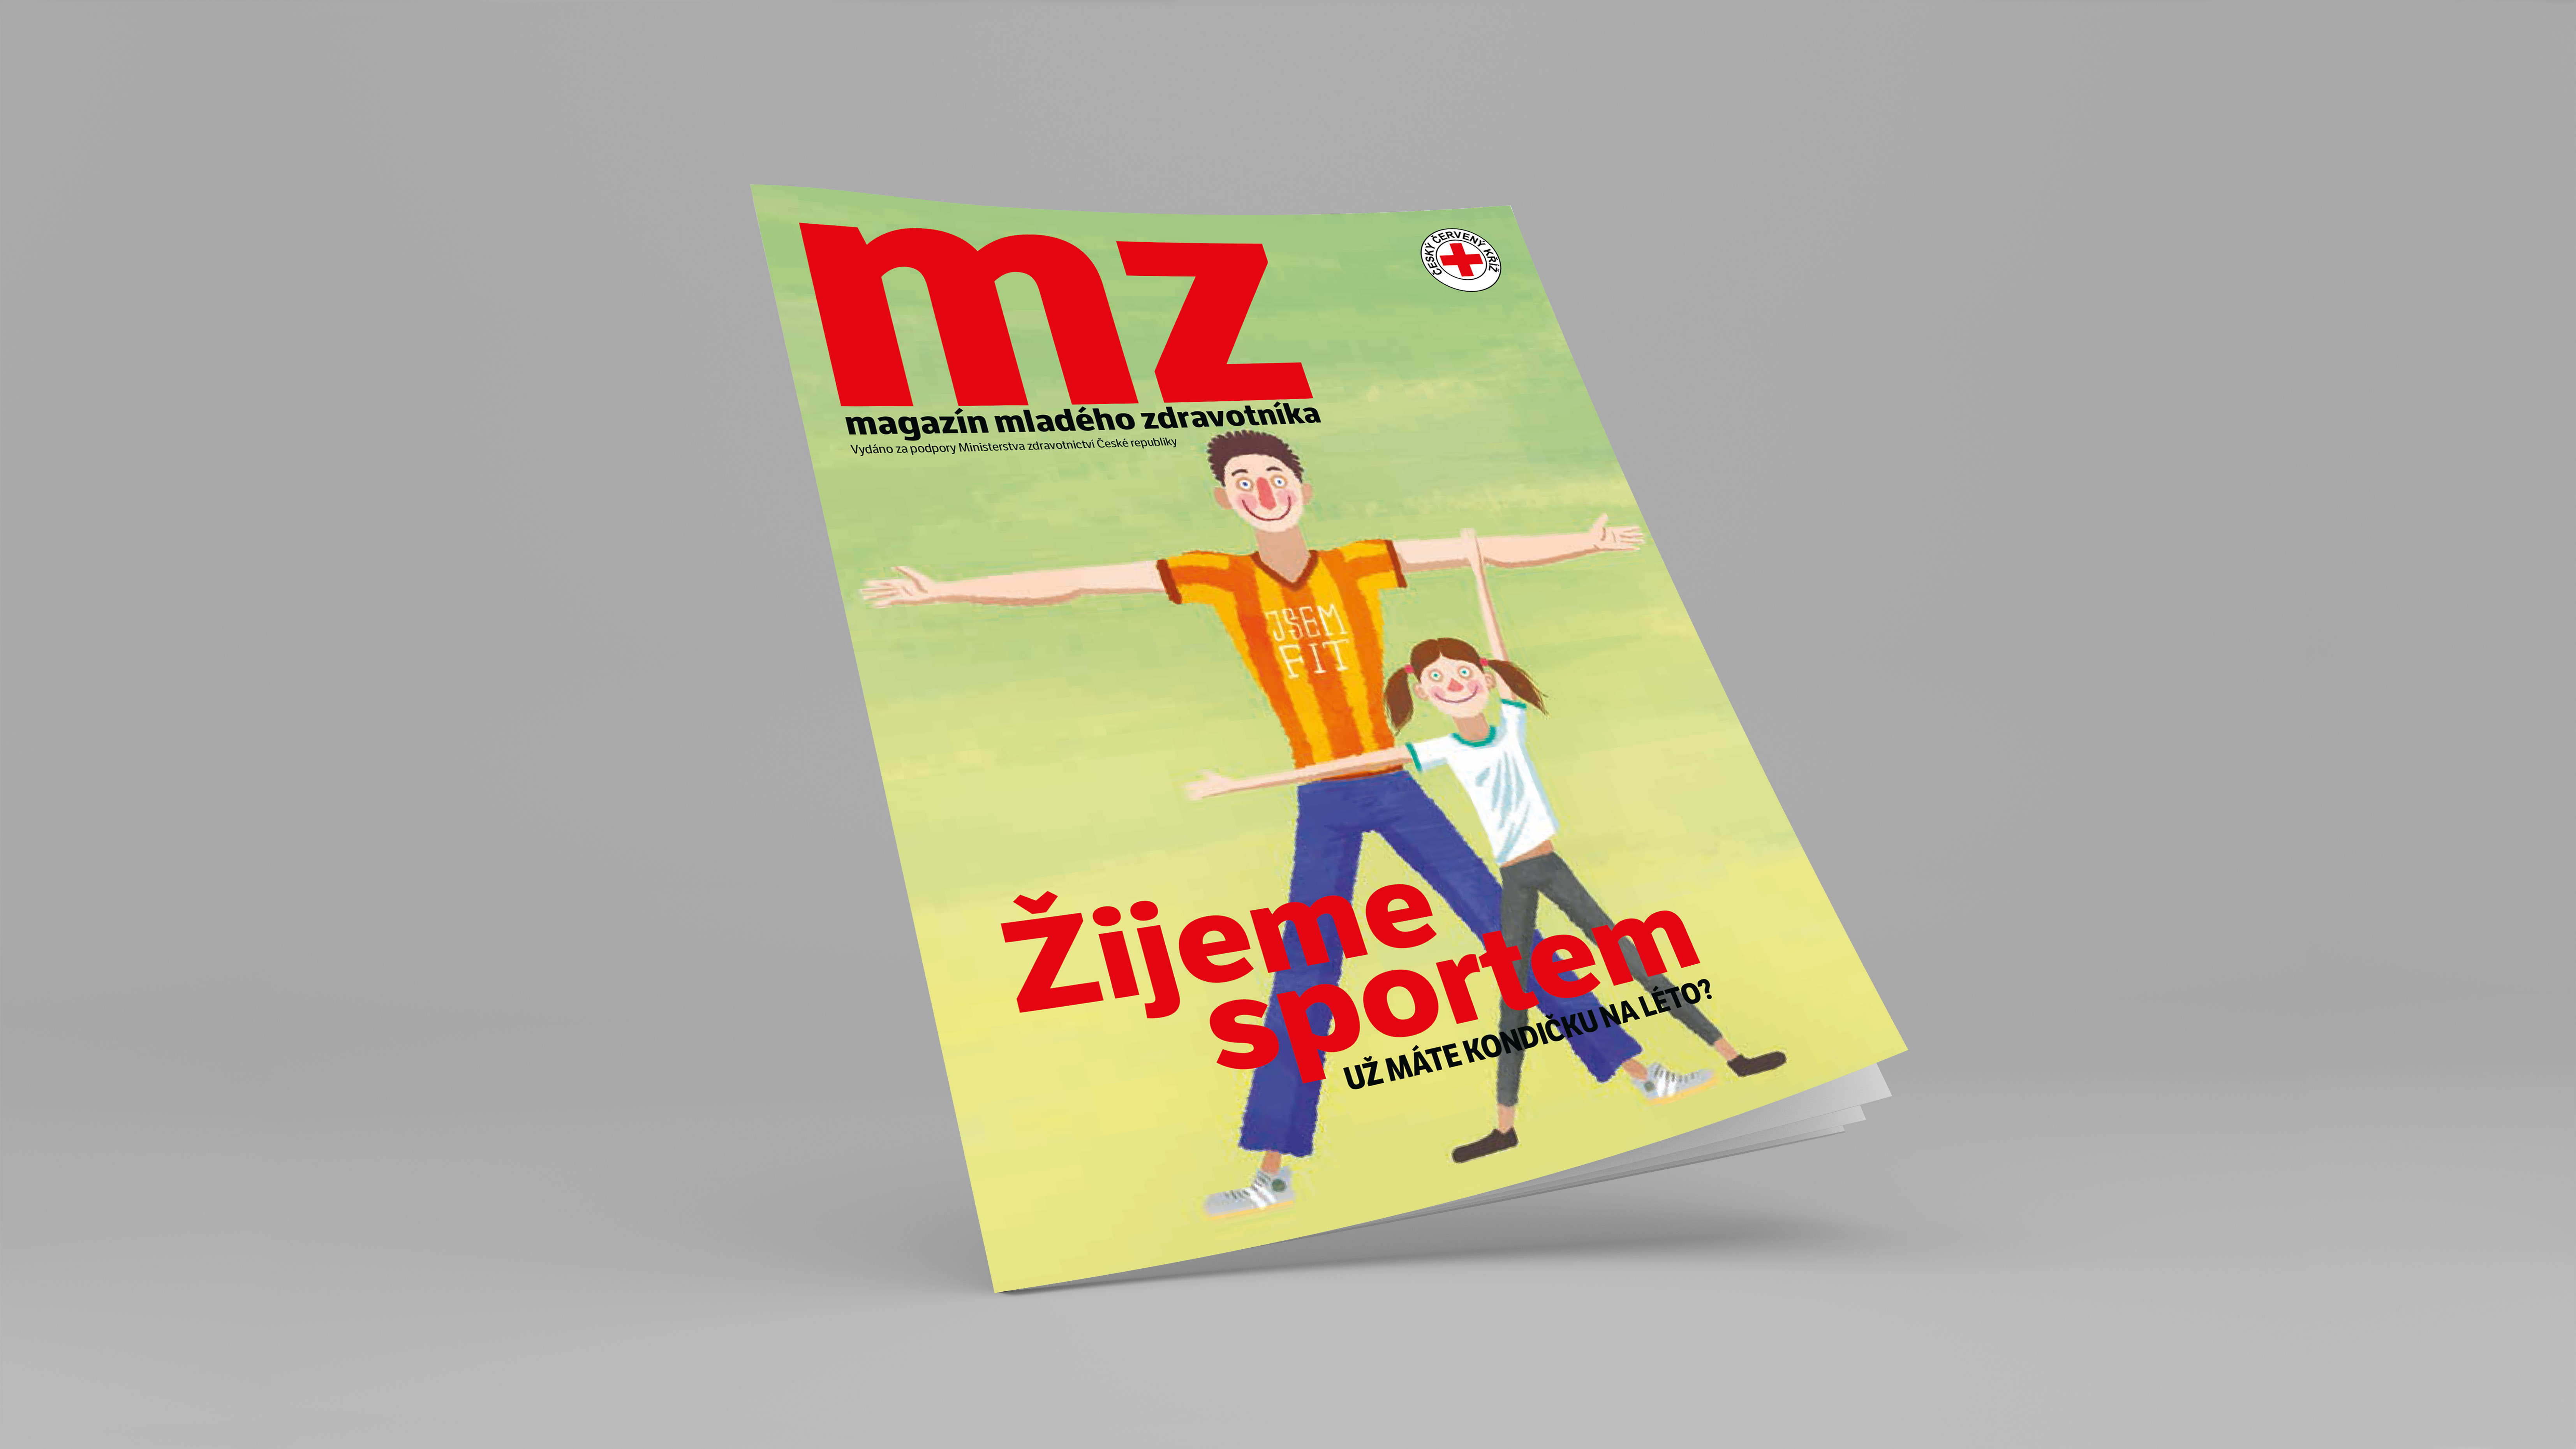 Magazín mladého zdravotníka ('Young Medic magazine')